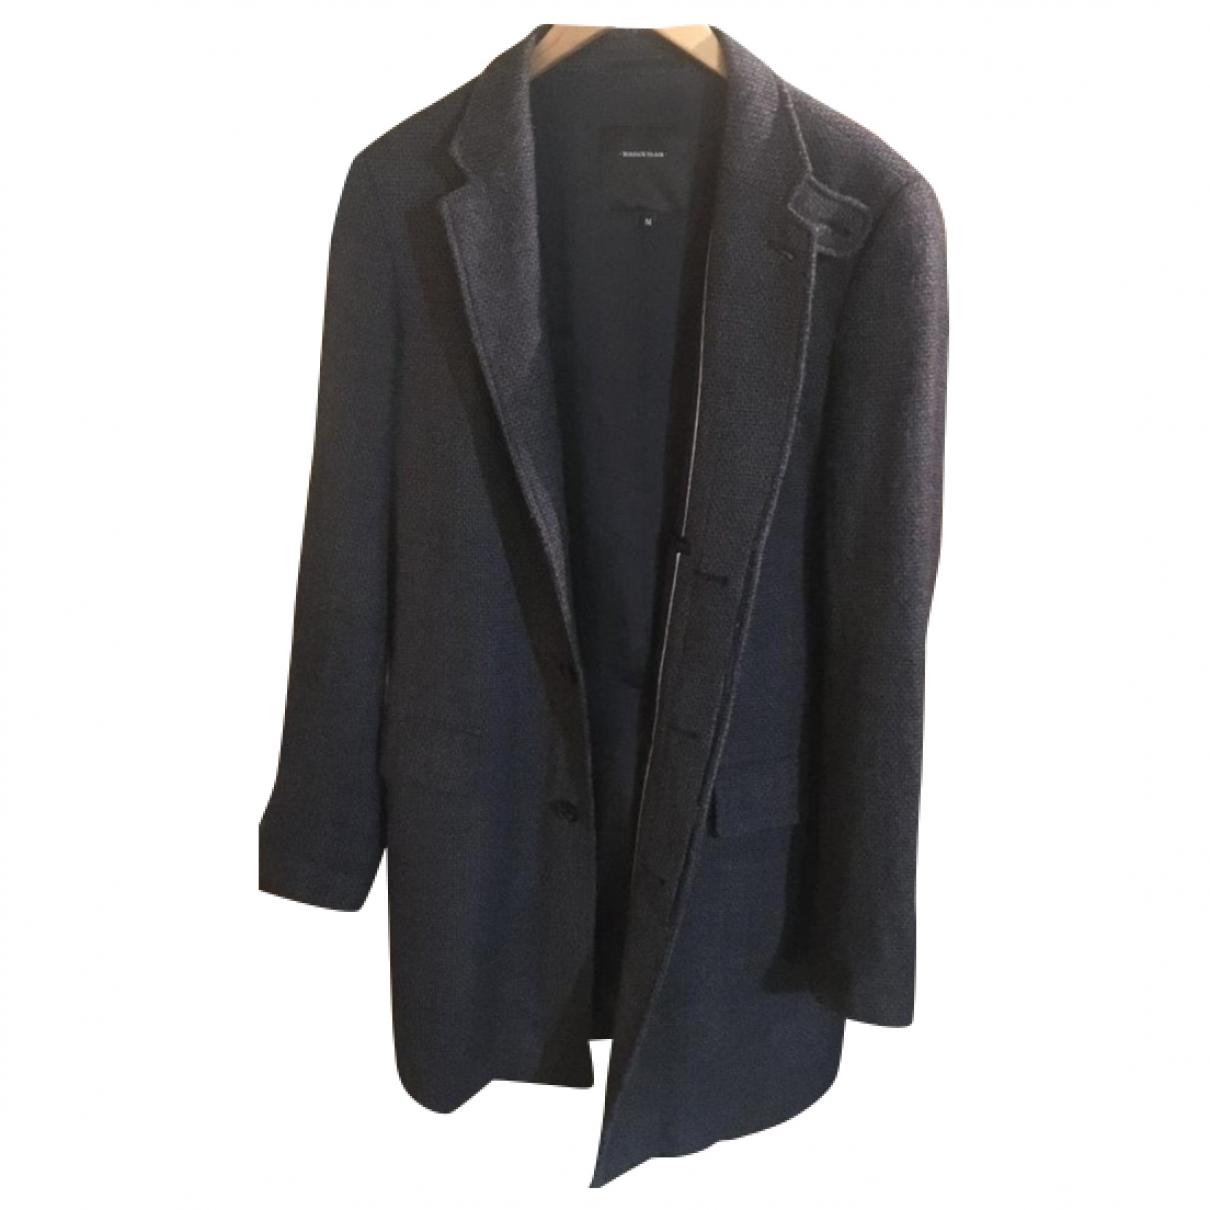 Surface To Air - Manteau   pour femme en tweed - anthracite